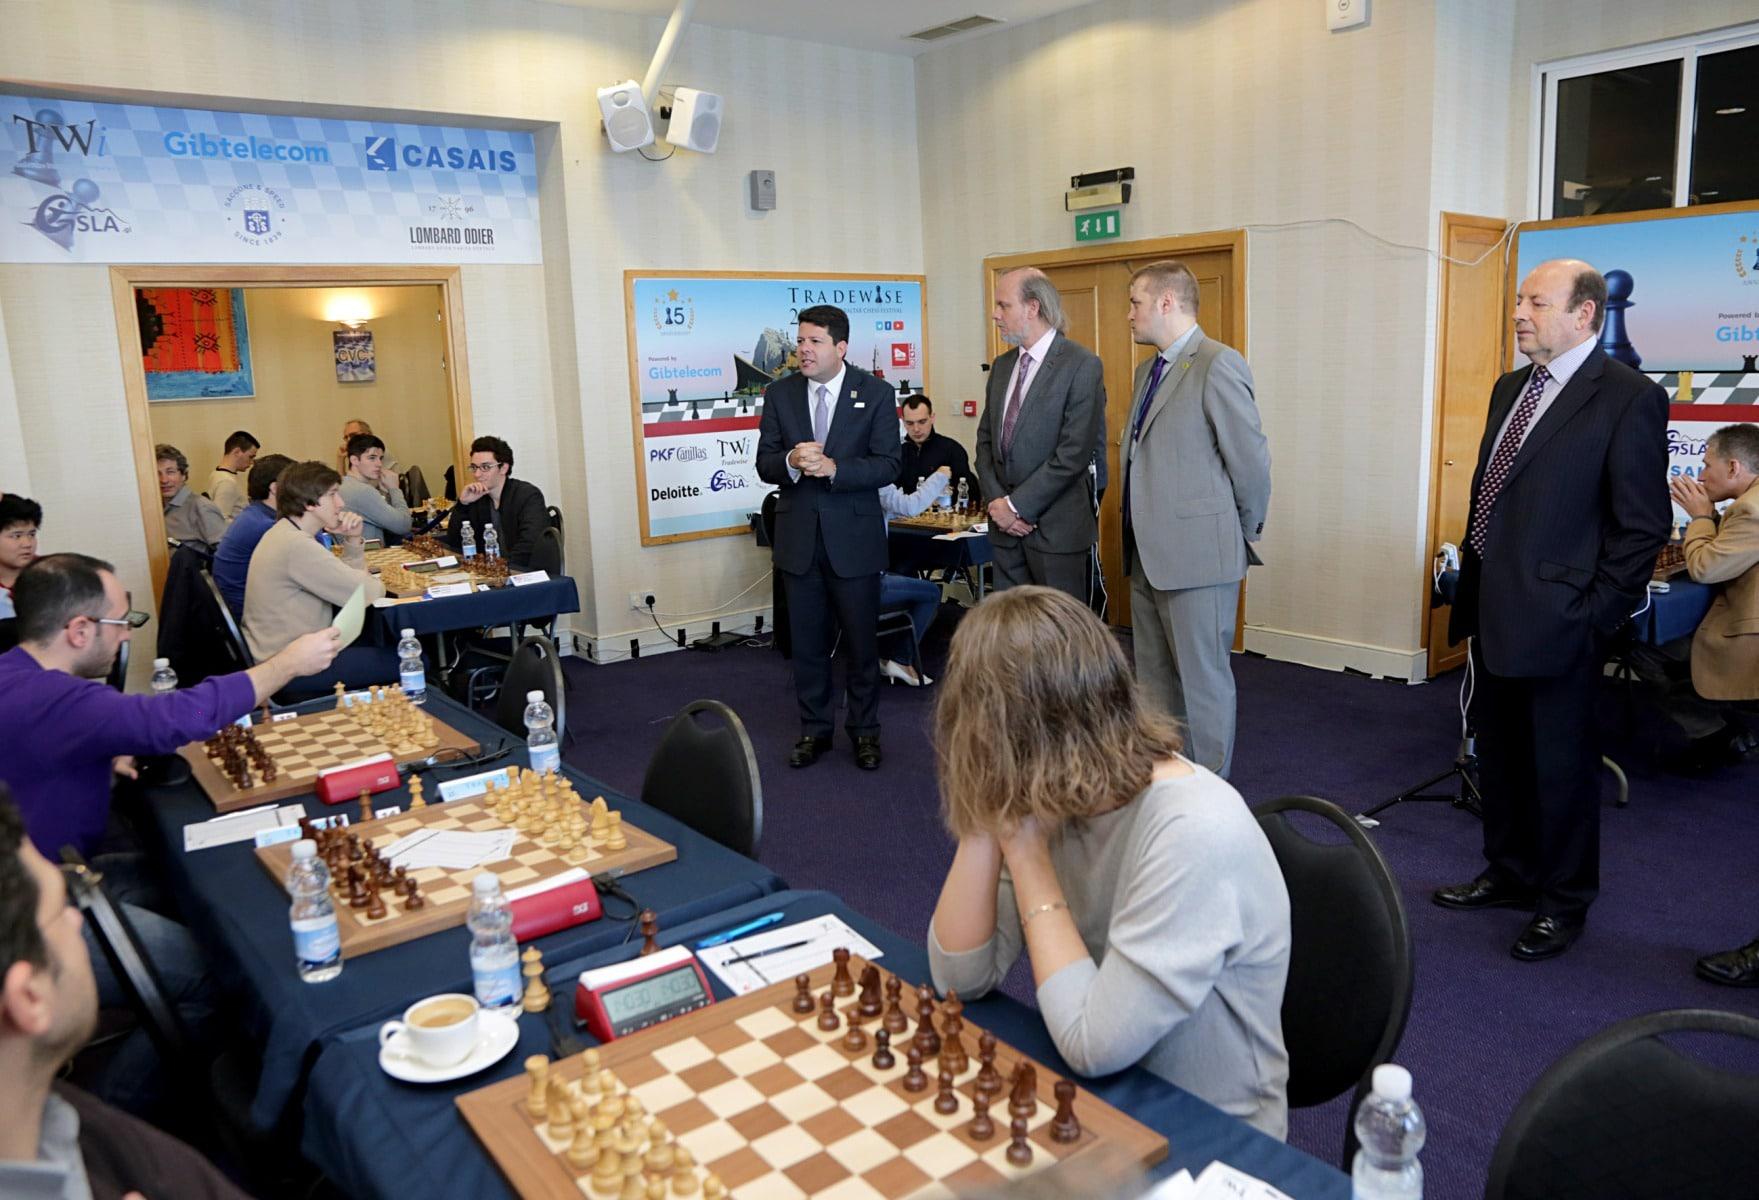 27-ene-17-fabin-picardo-visita-el-open-de-gibraltar-de-ajedrez-8_31742539443_o